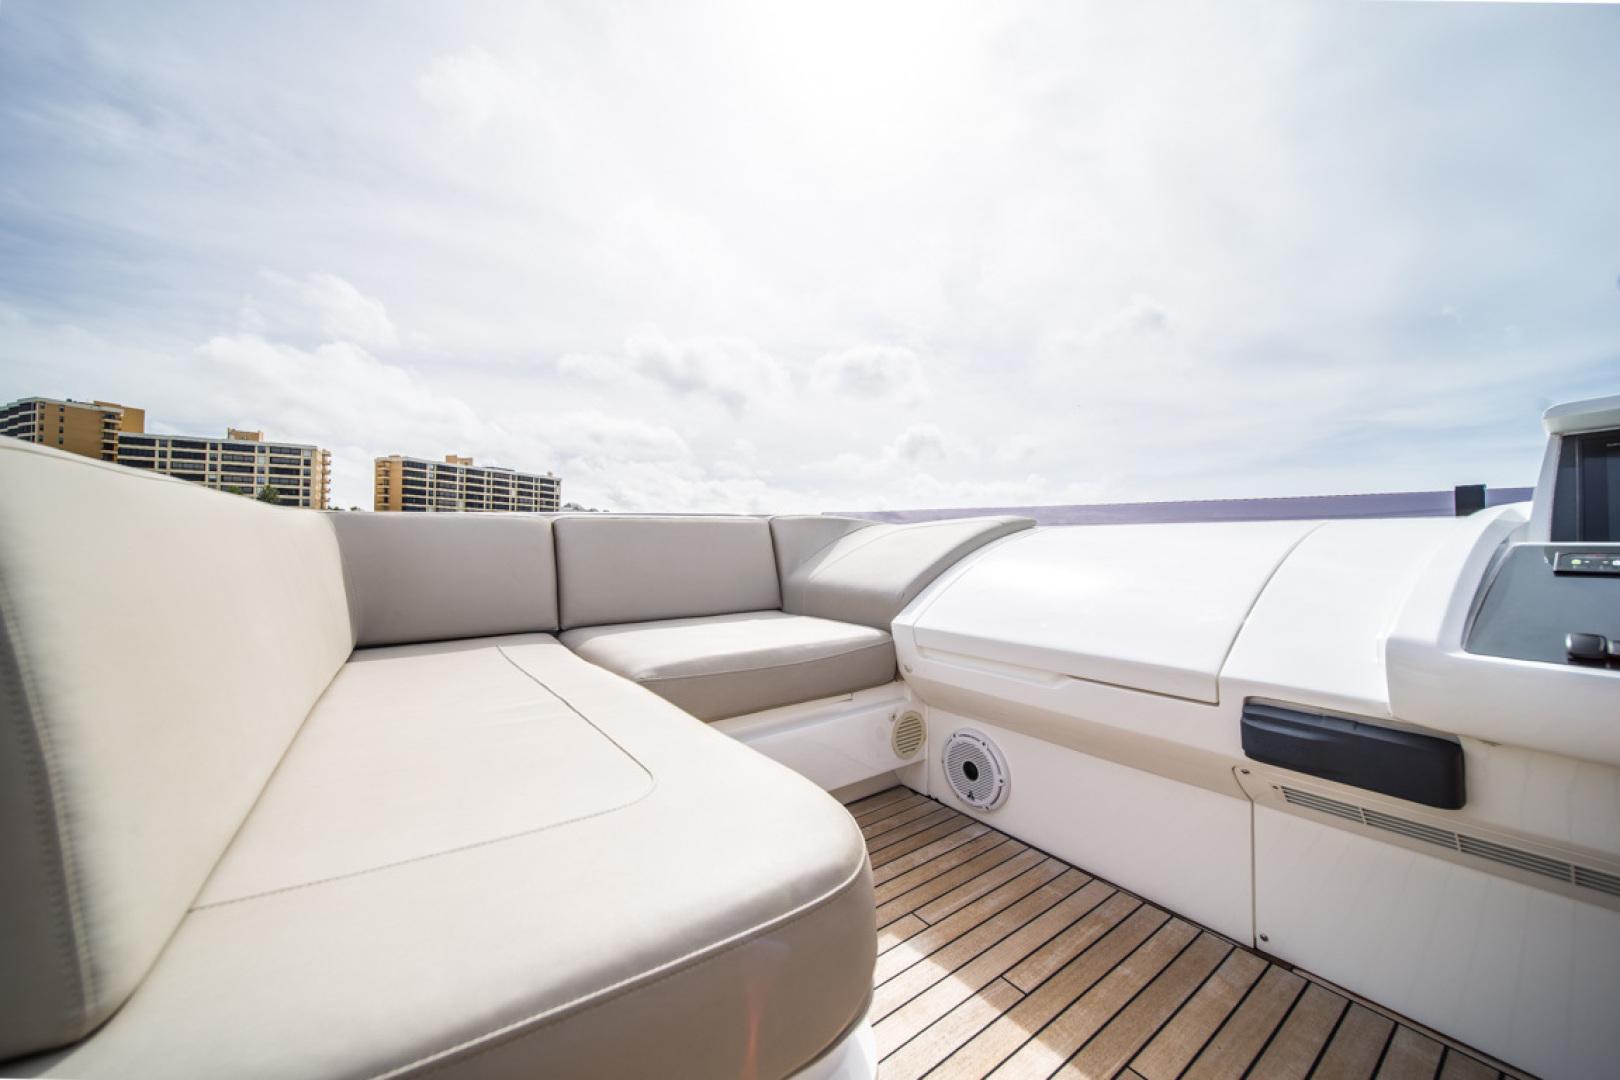 Princess-S65 2019-Paragon Cape Coral-Florida-United States-2019 65 Princess S65-Paragon-Flybridge Portside-1510309 | Thumbnail